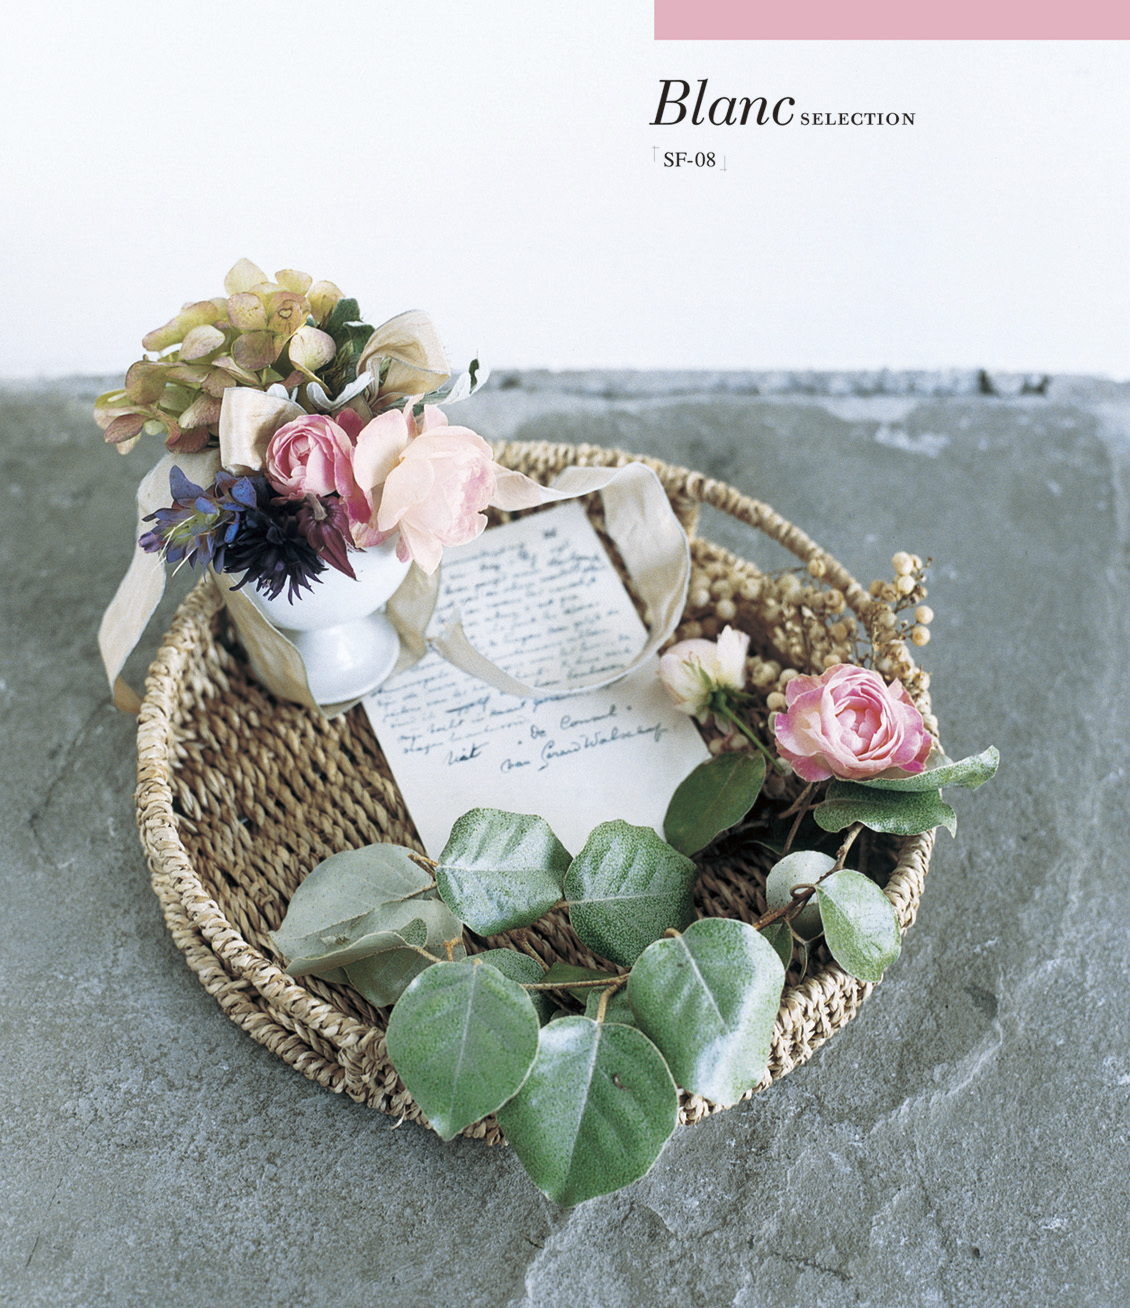 Blanc SF-08